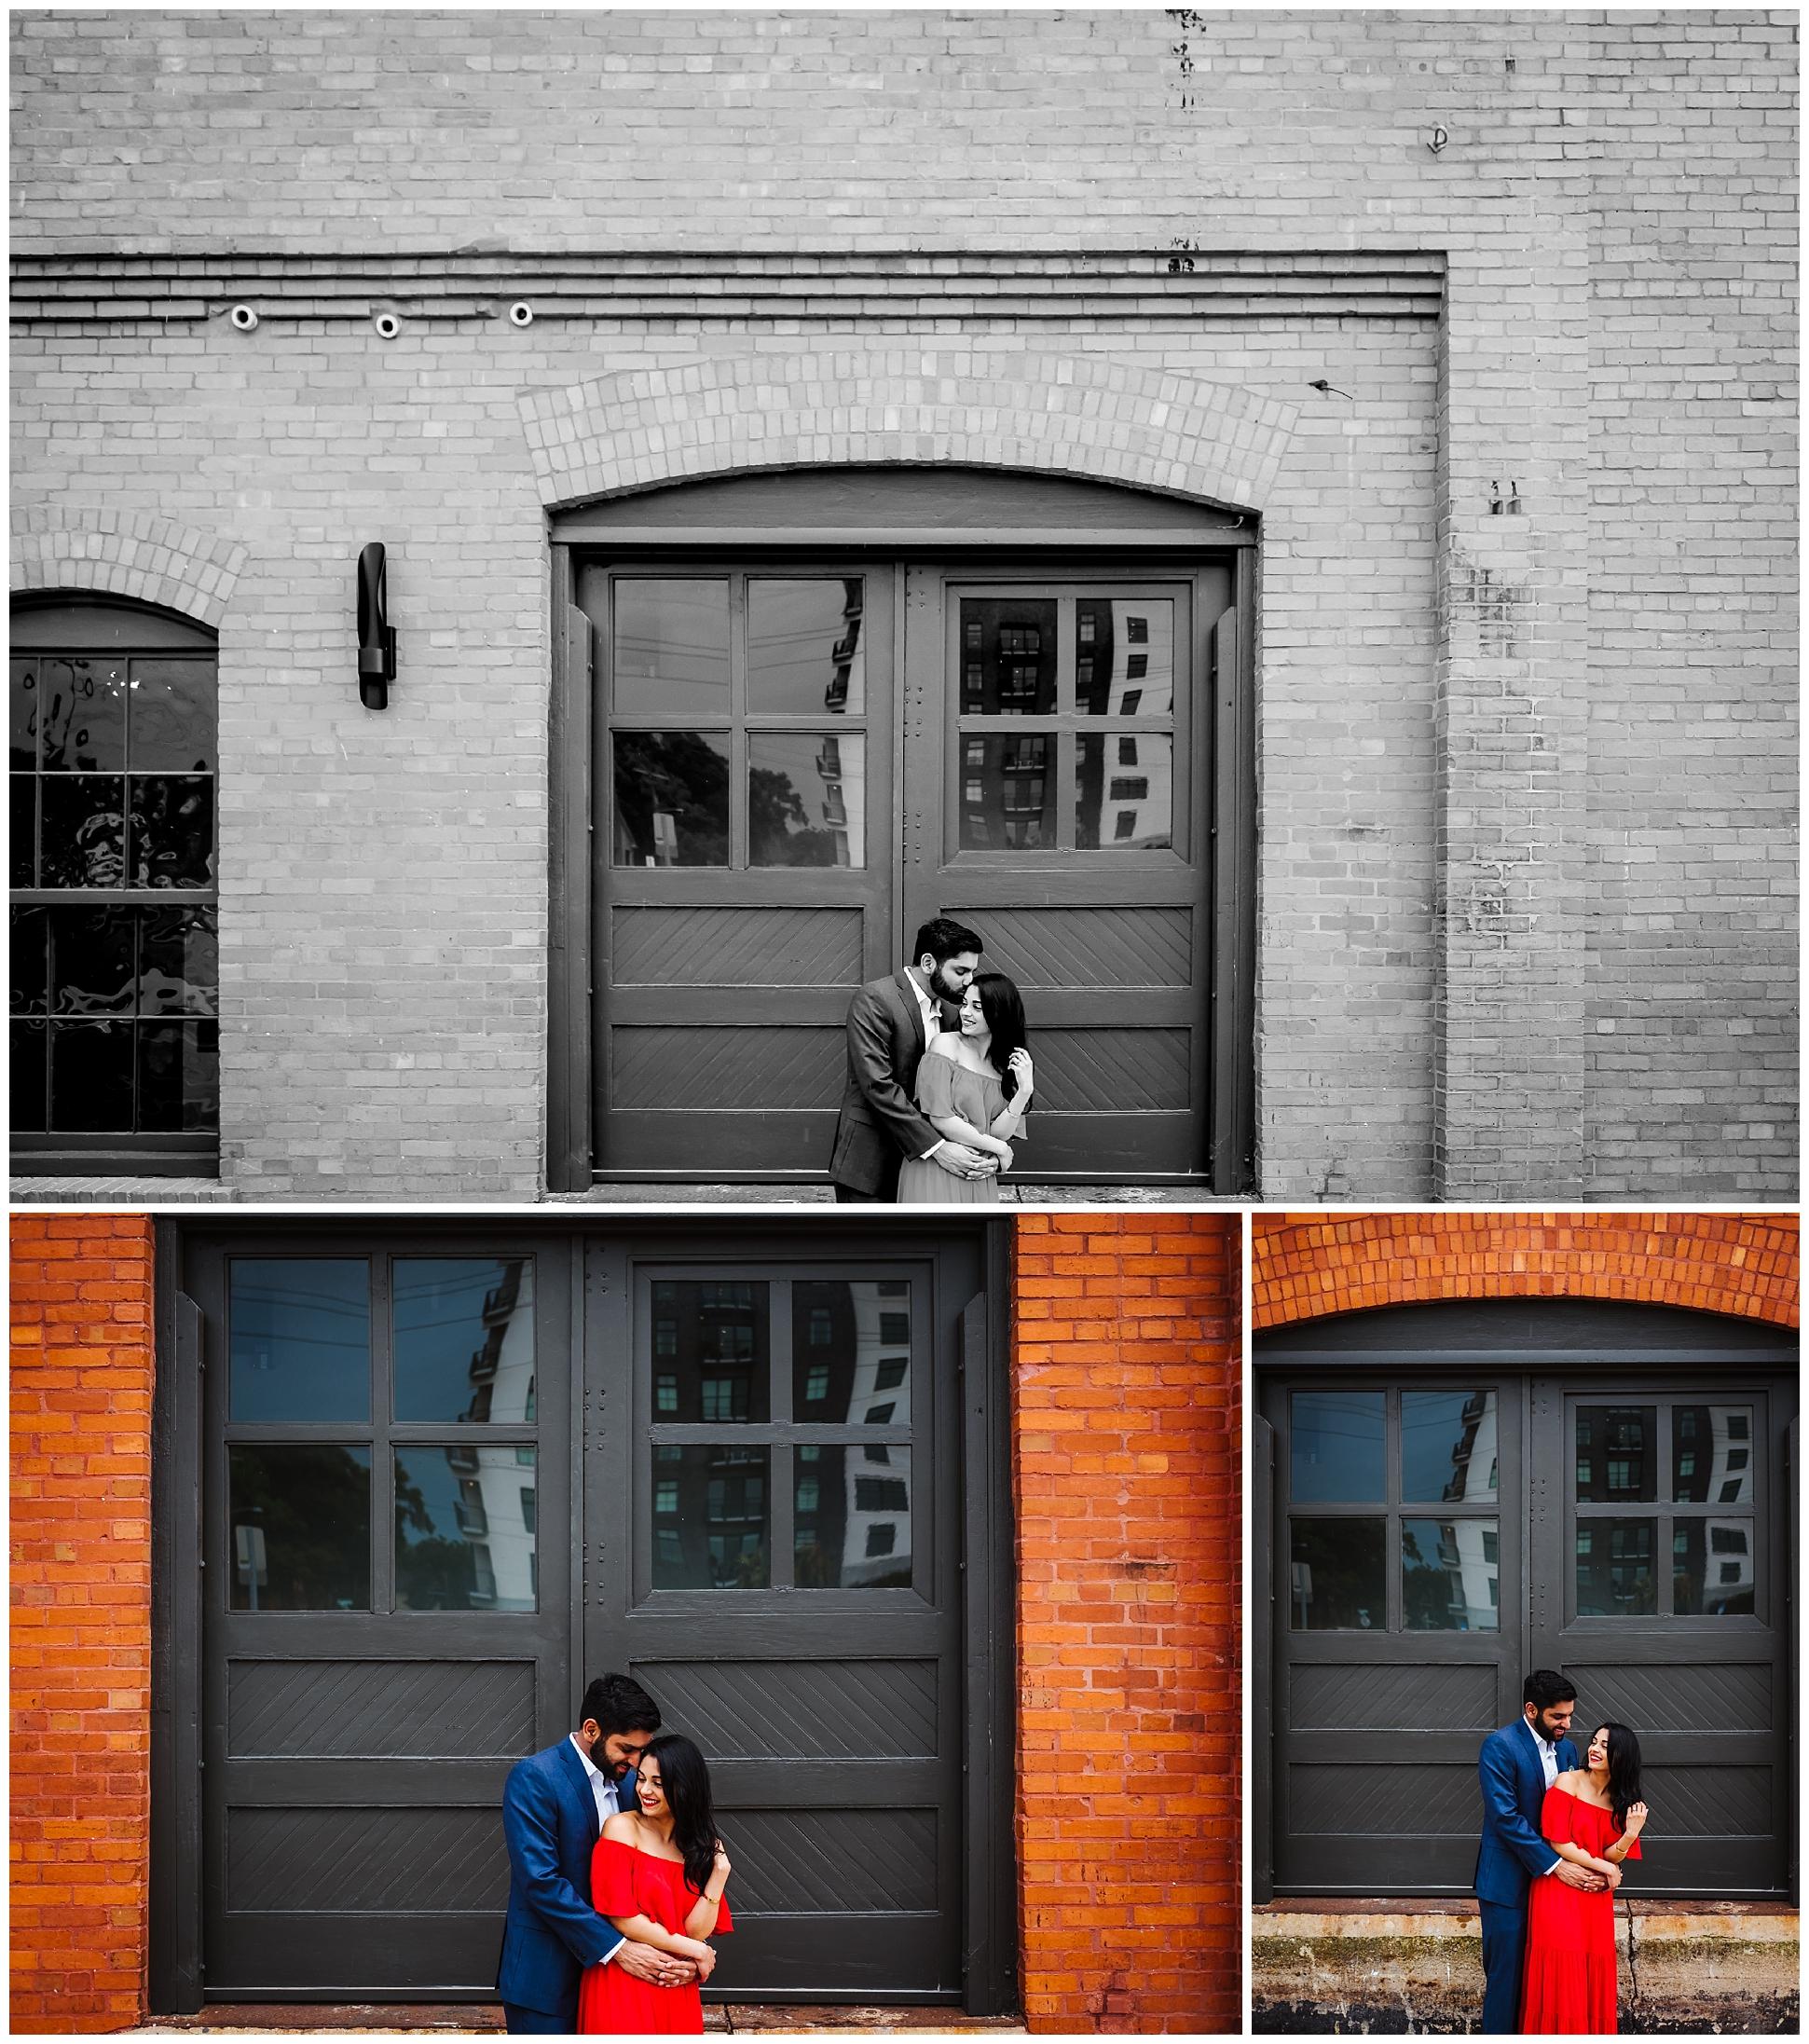 armature-works-tampa-engagement-portraits_0002.jpg